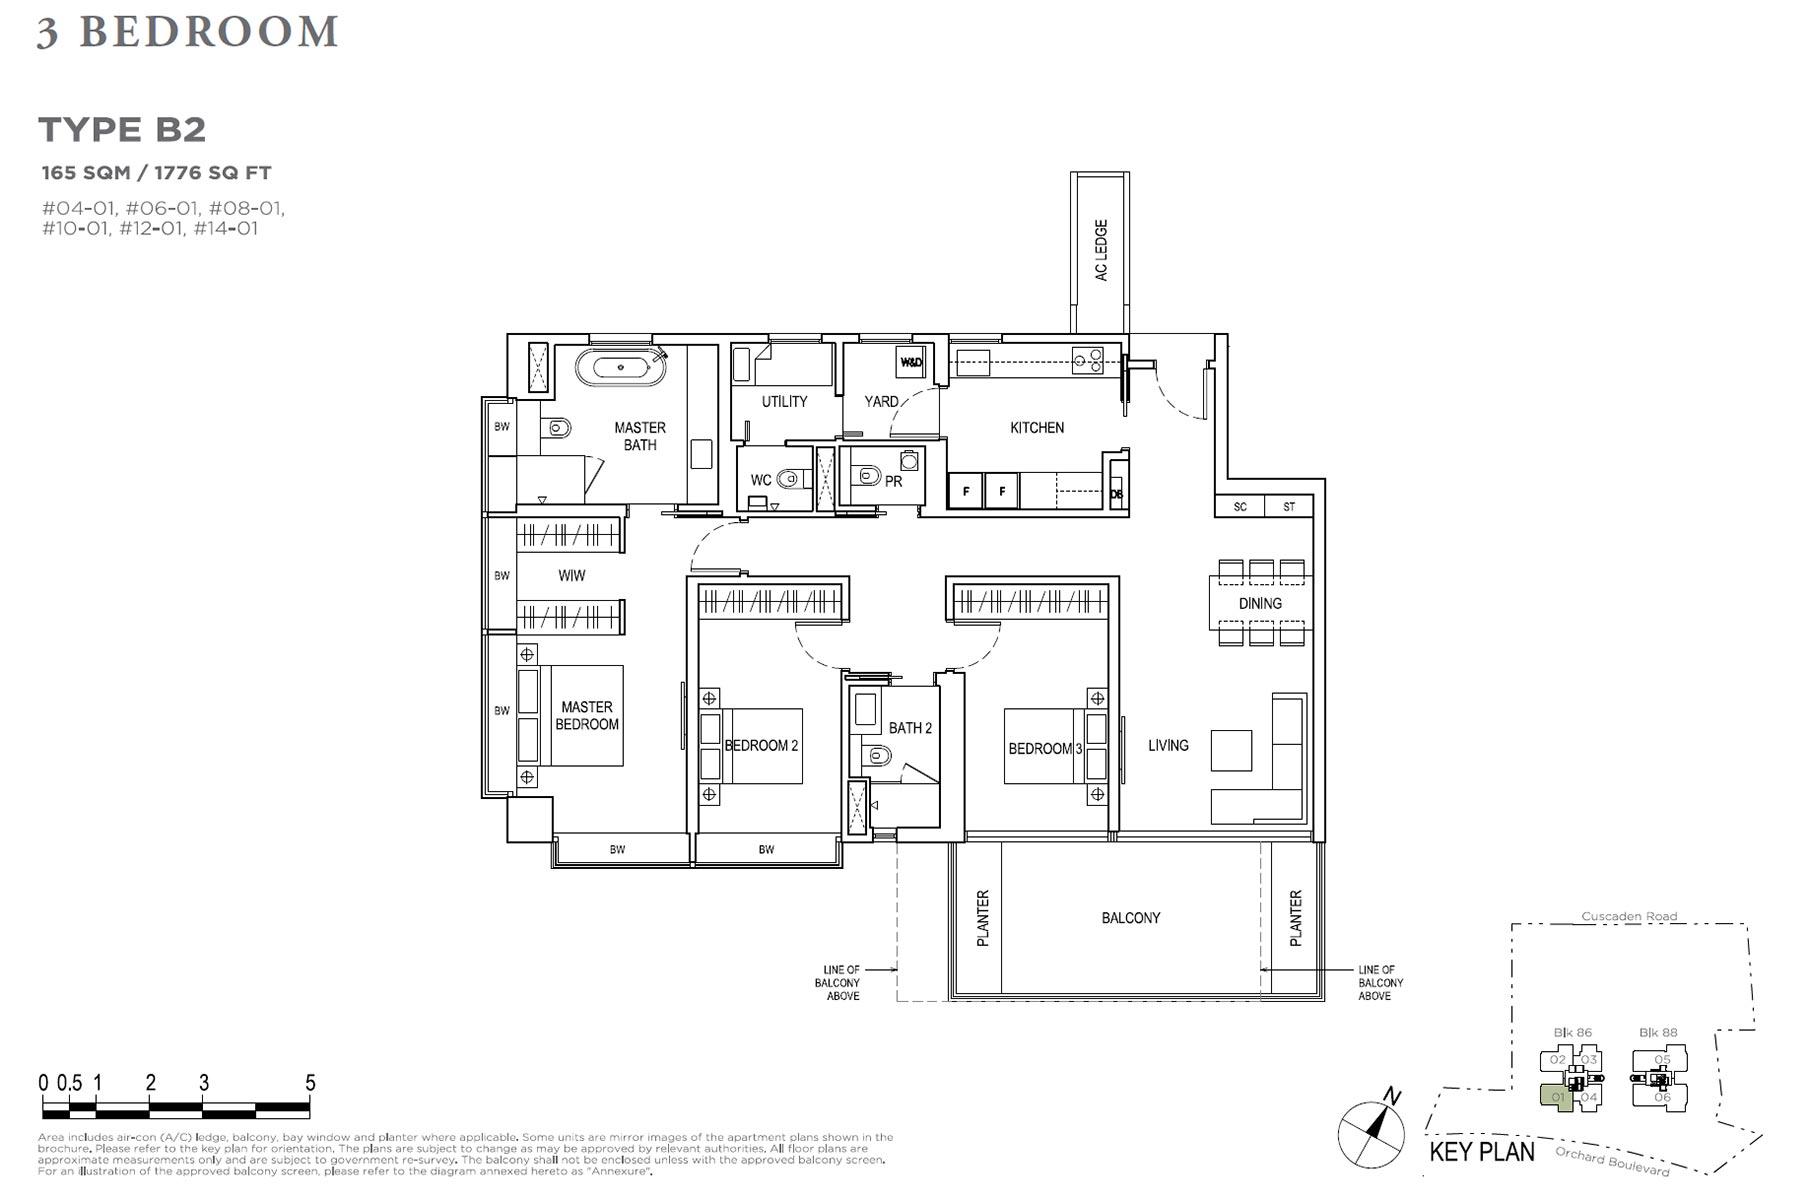 Boulevard 88 3 Bedroom + Study - Type B2